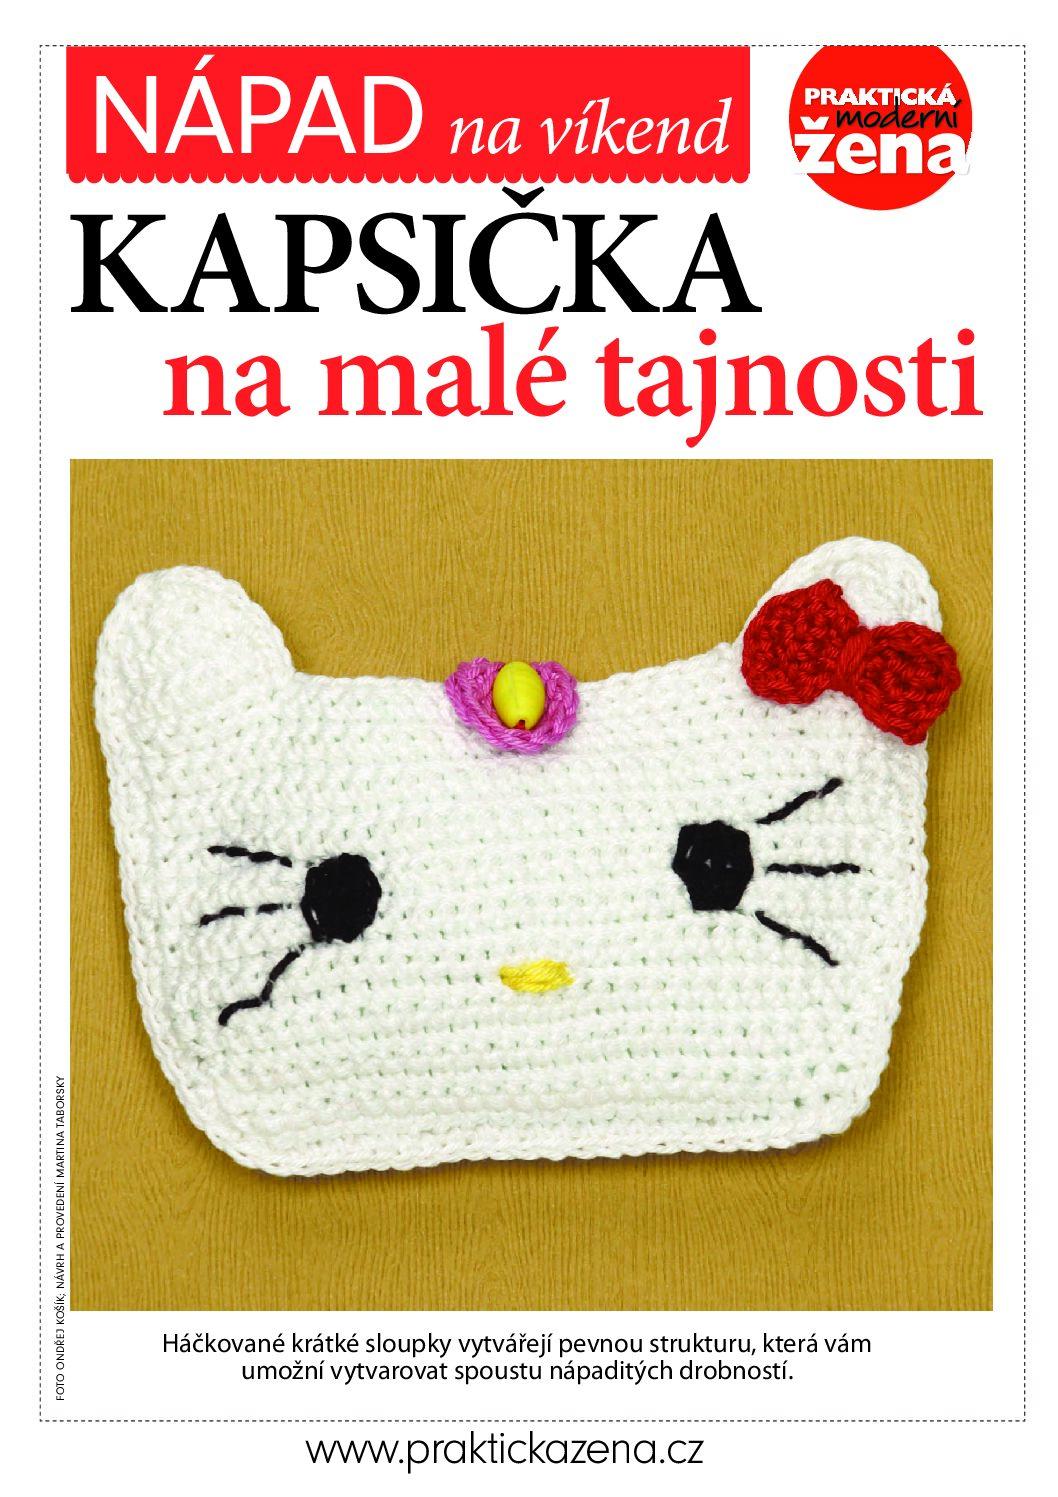 NAPAD na vikend KAPSICKA pdf